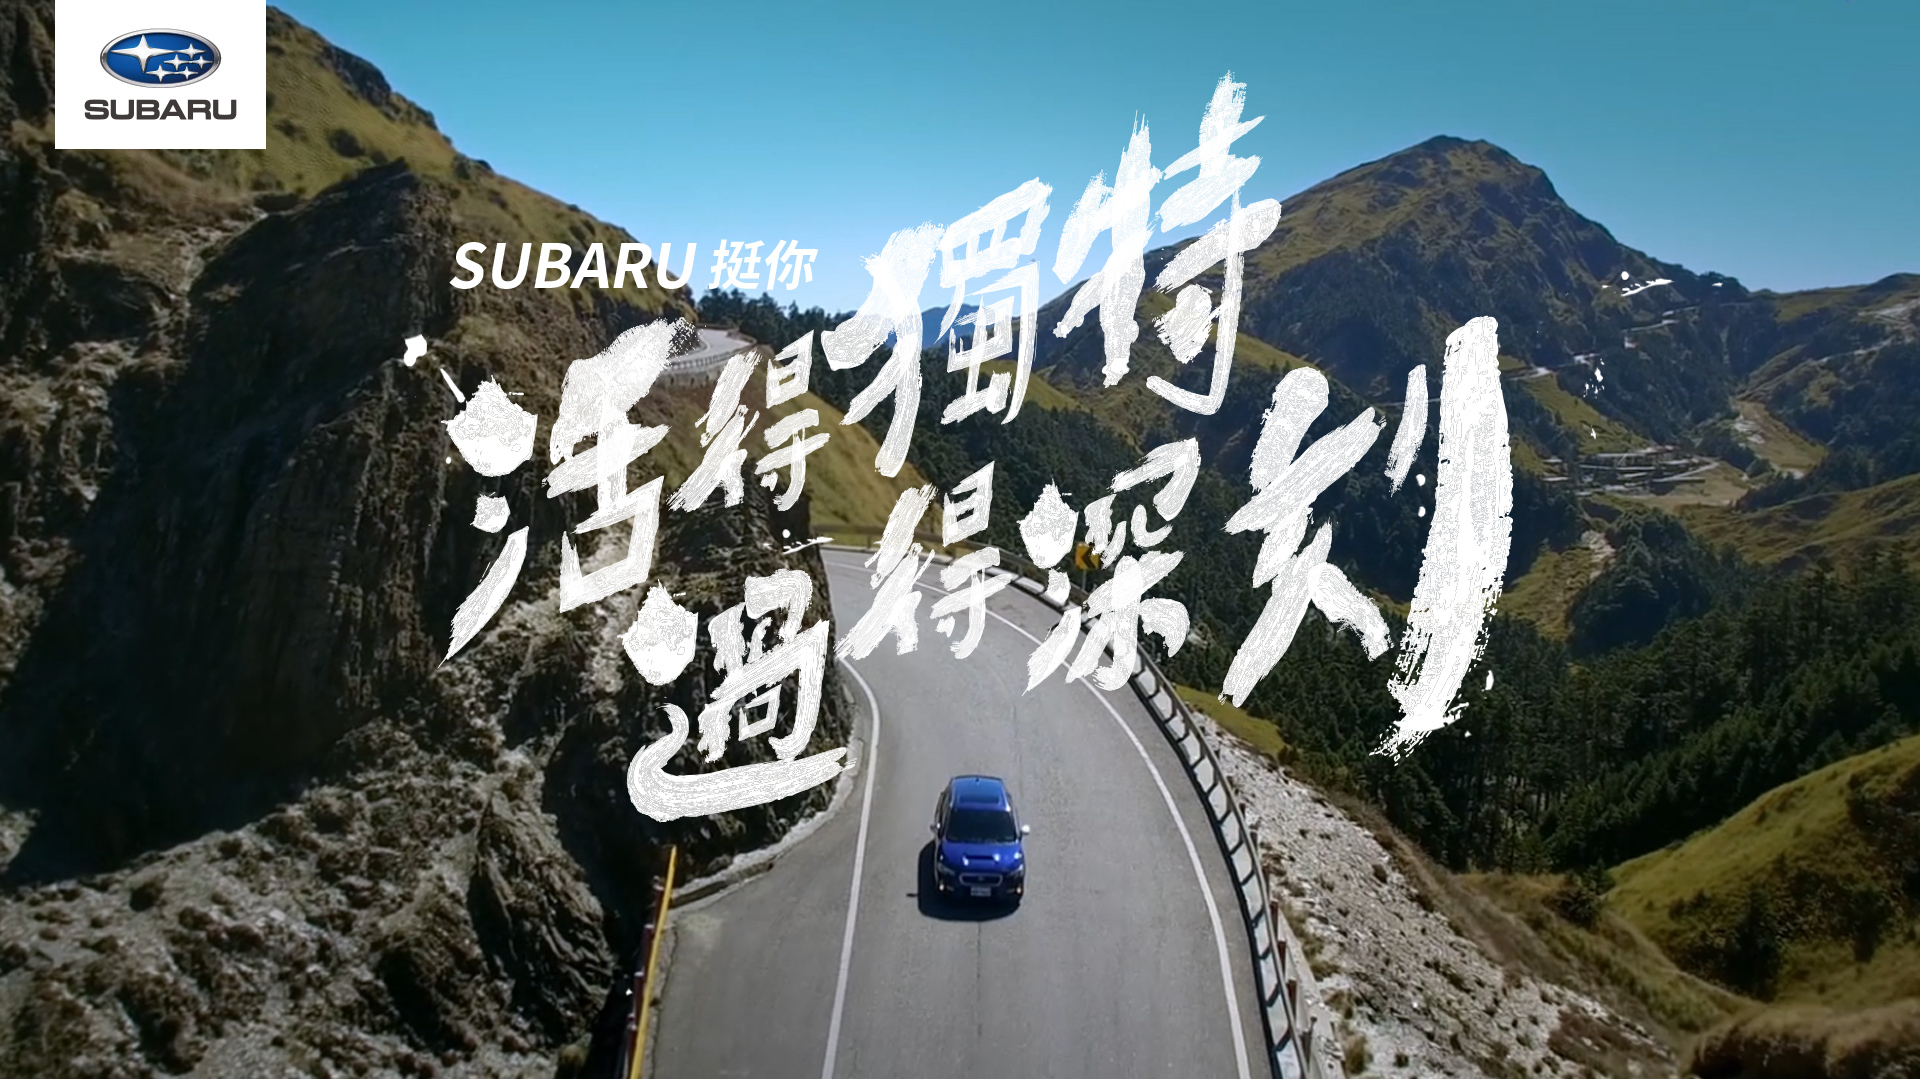 「Subaru 挺你活得獨特 過得深刻」車主影片募集活動開跑,總獎金達 15 萬